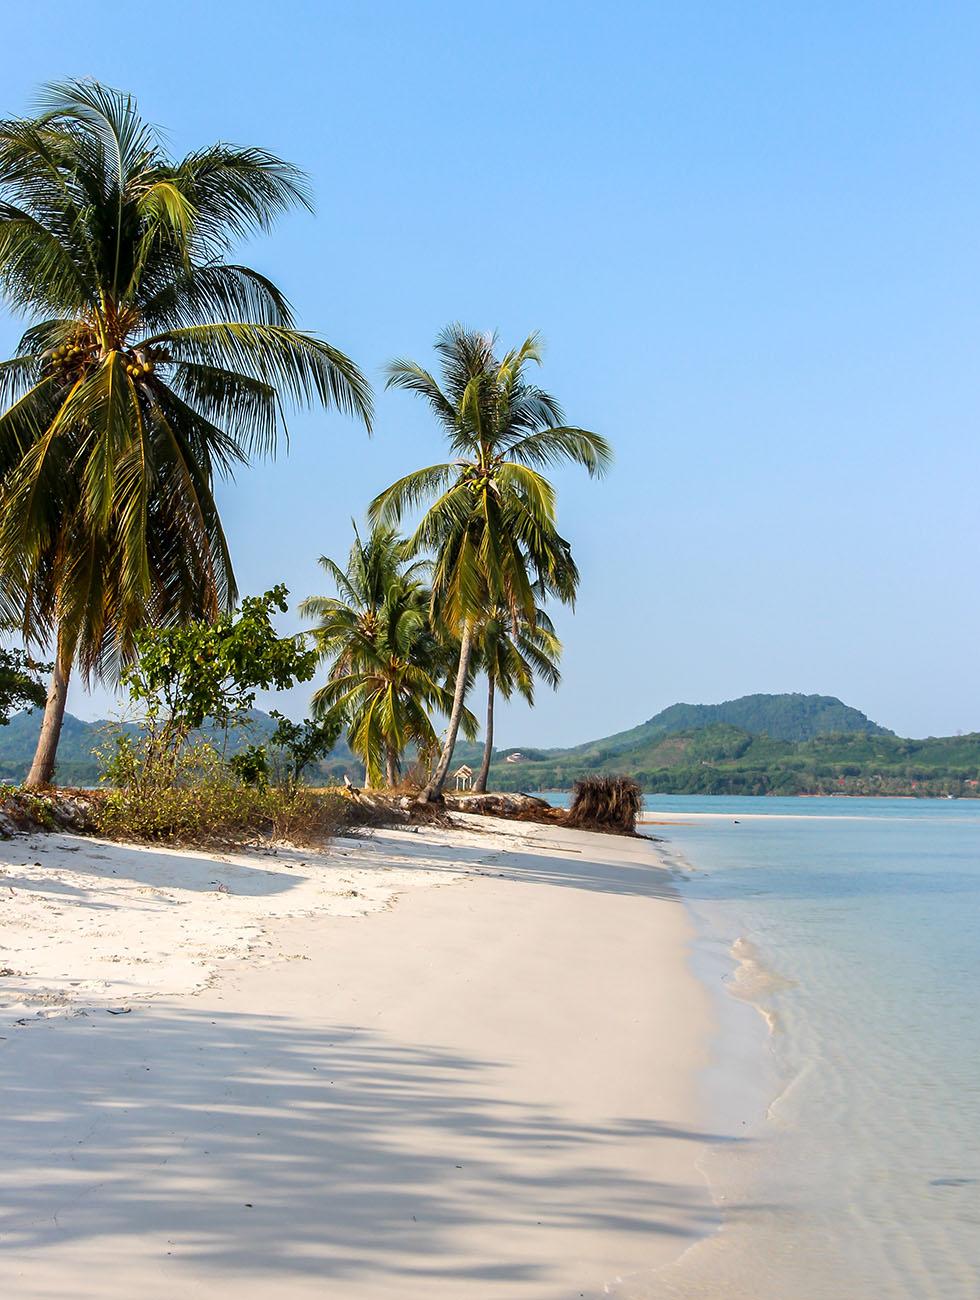 Koh Yao Yai northeast beaches